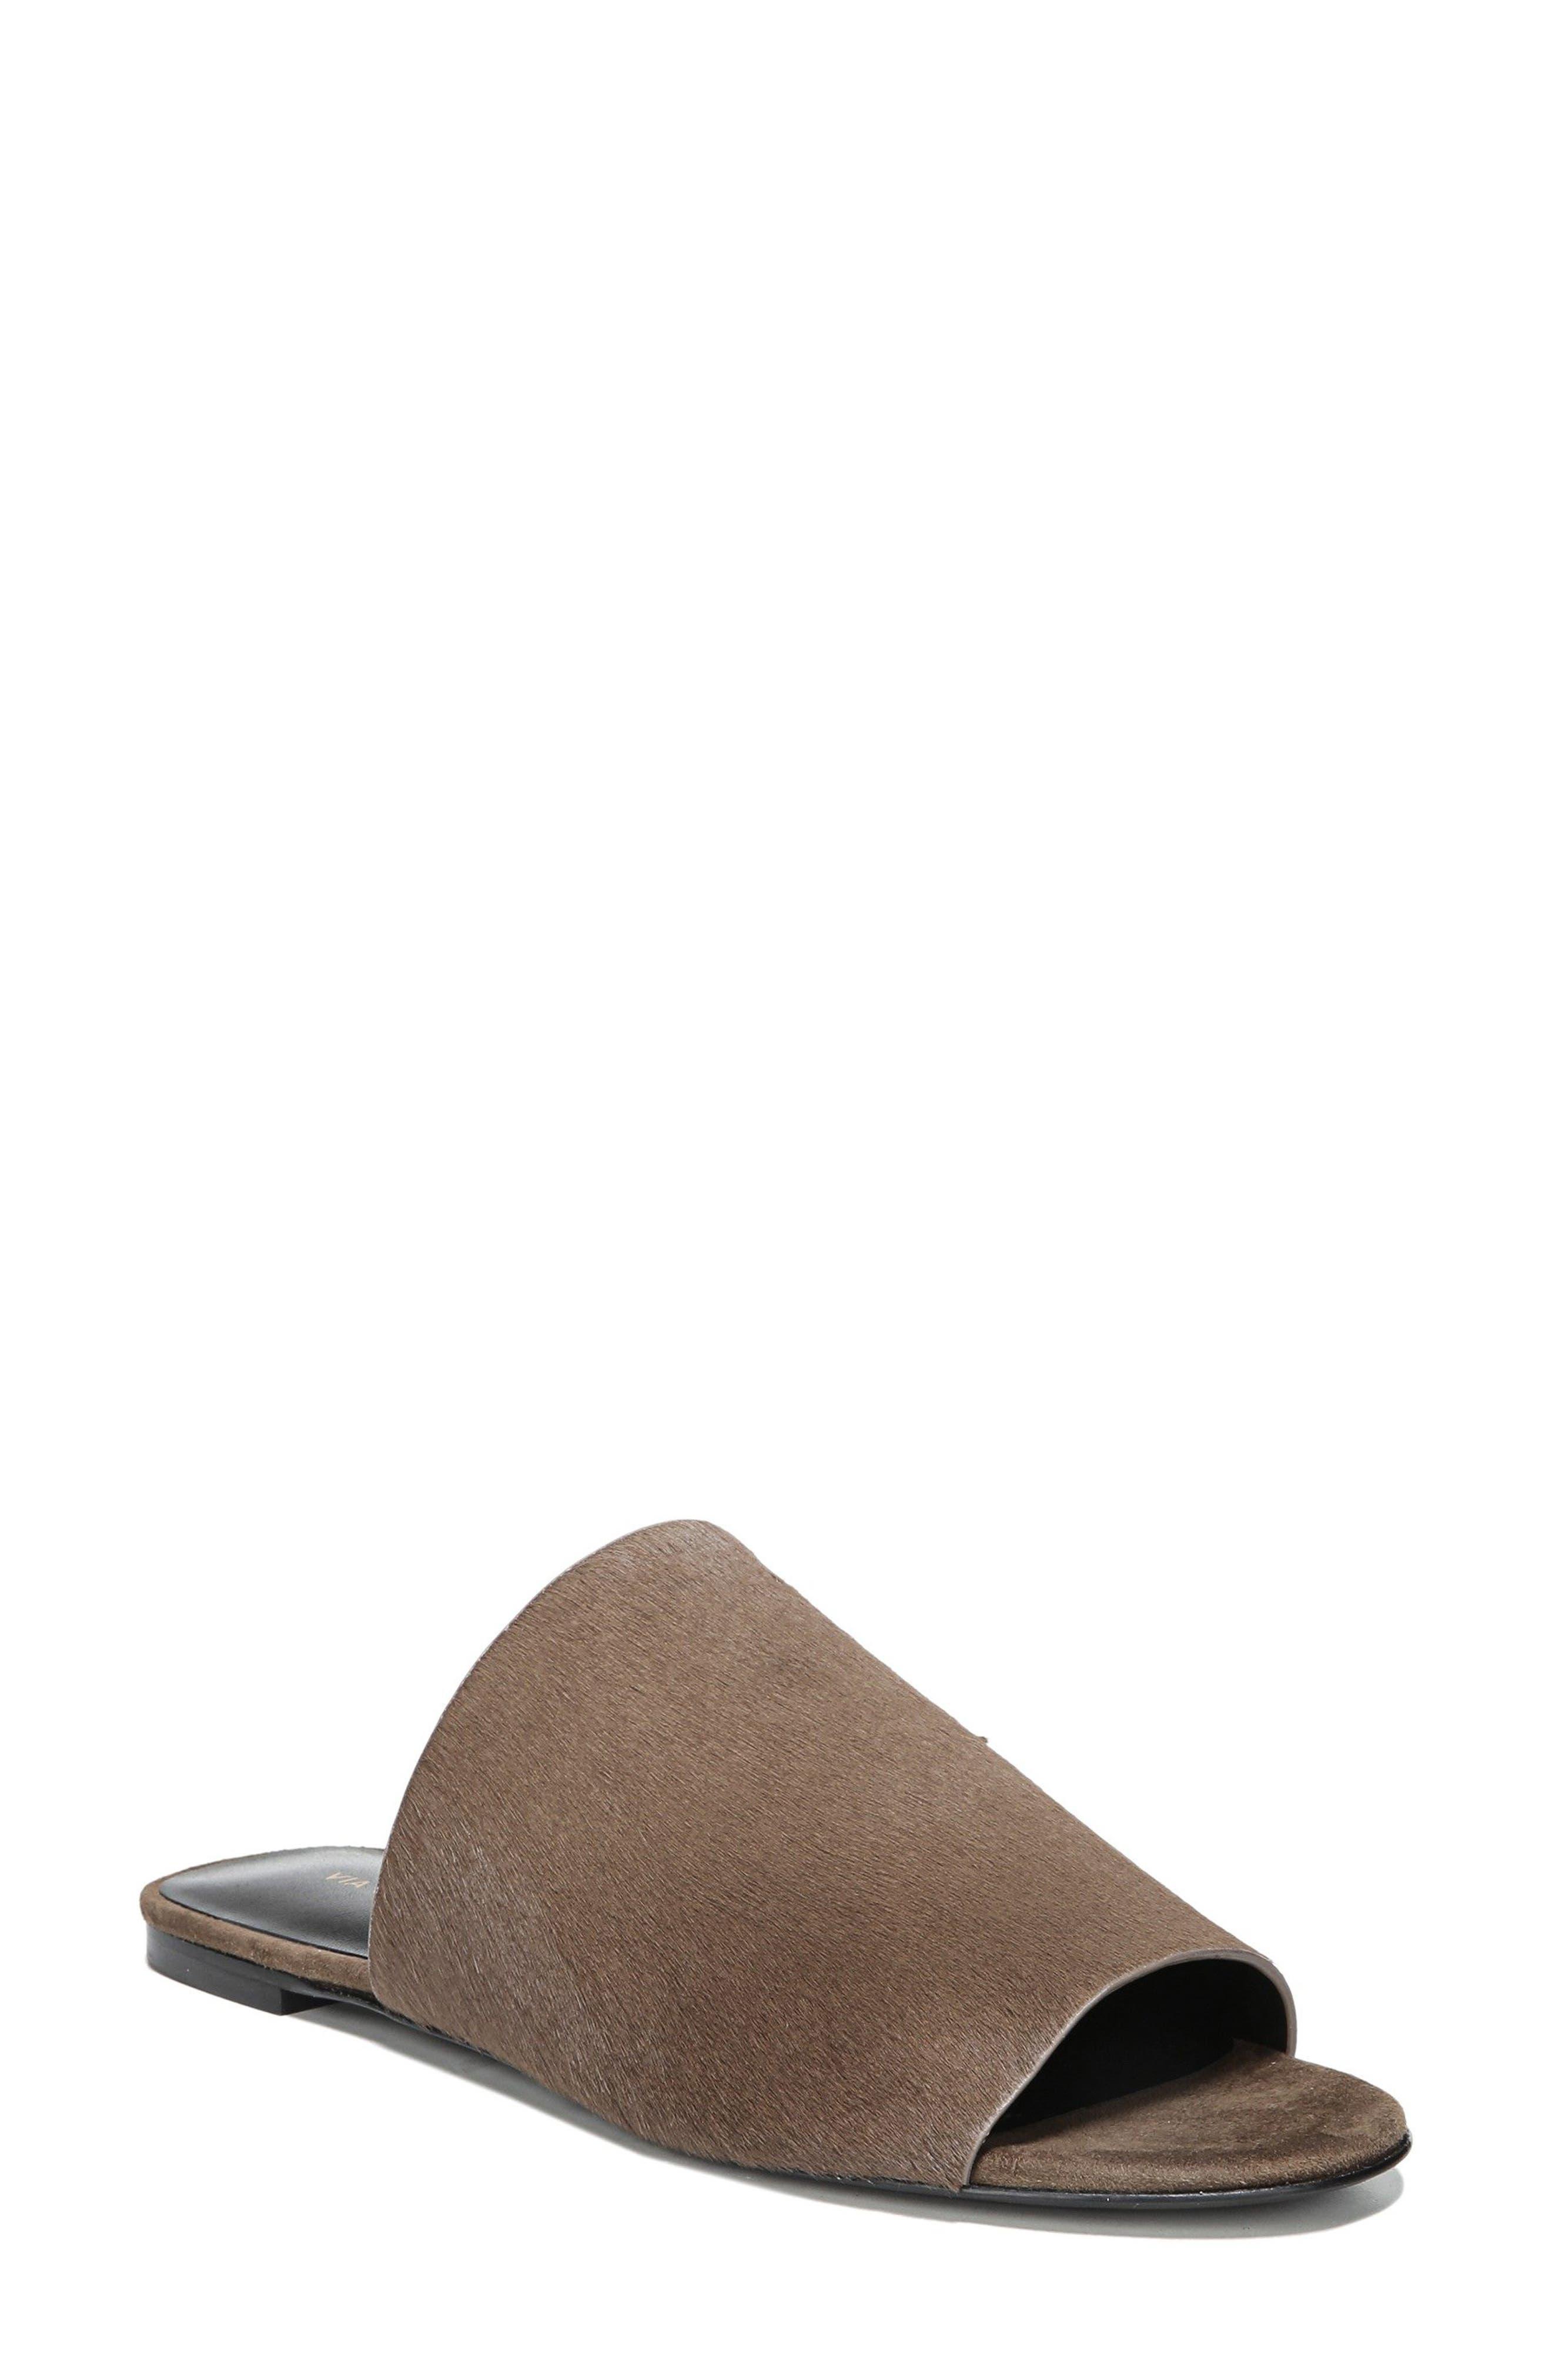 Via Spiga Heather 2 Genuine Calf Hair Slide Sandal (Women)